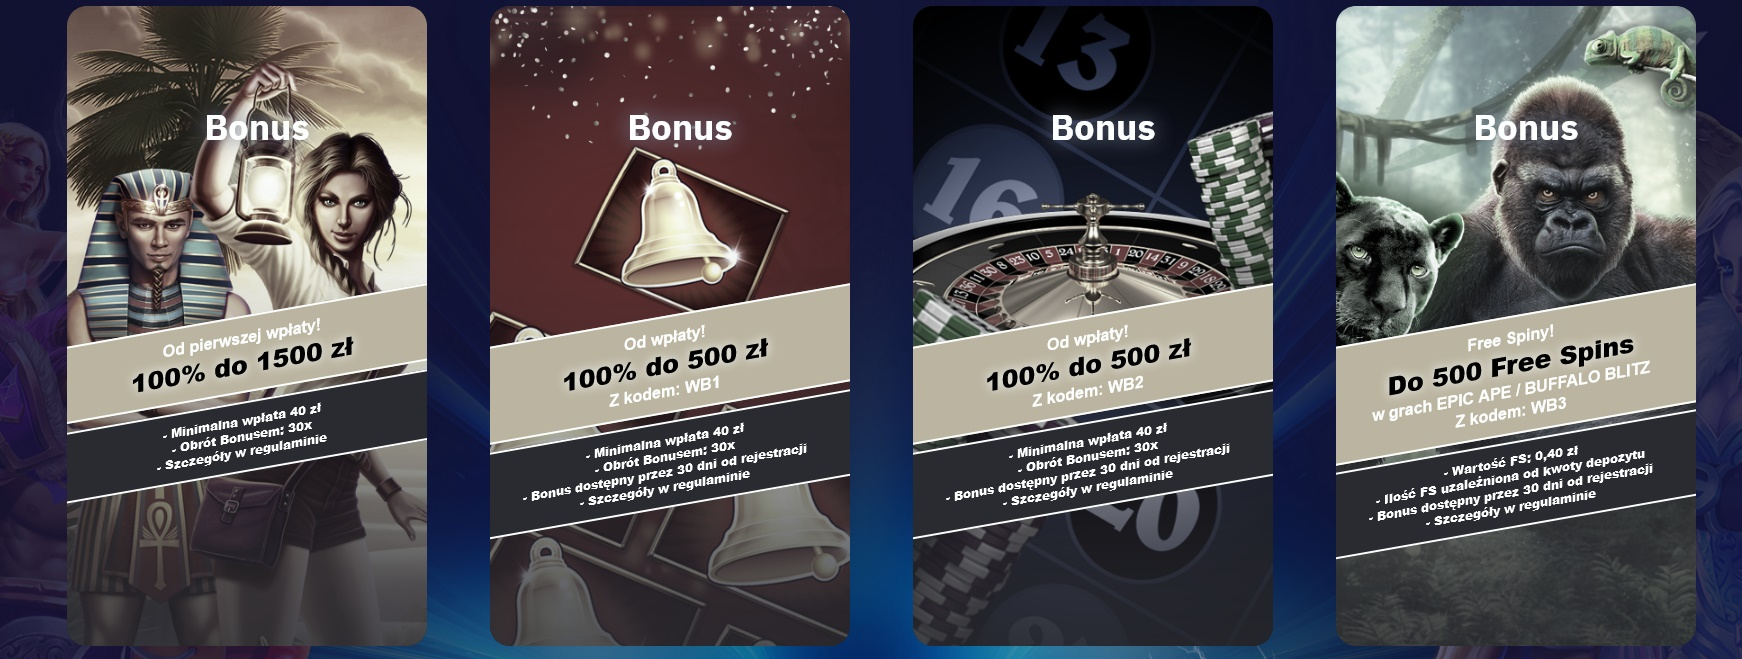 total-casino-promo